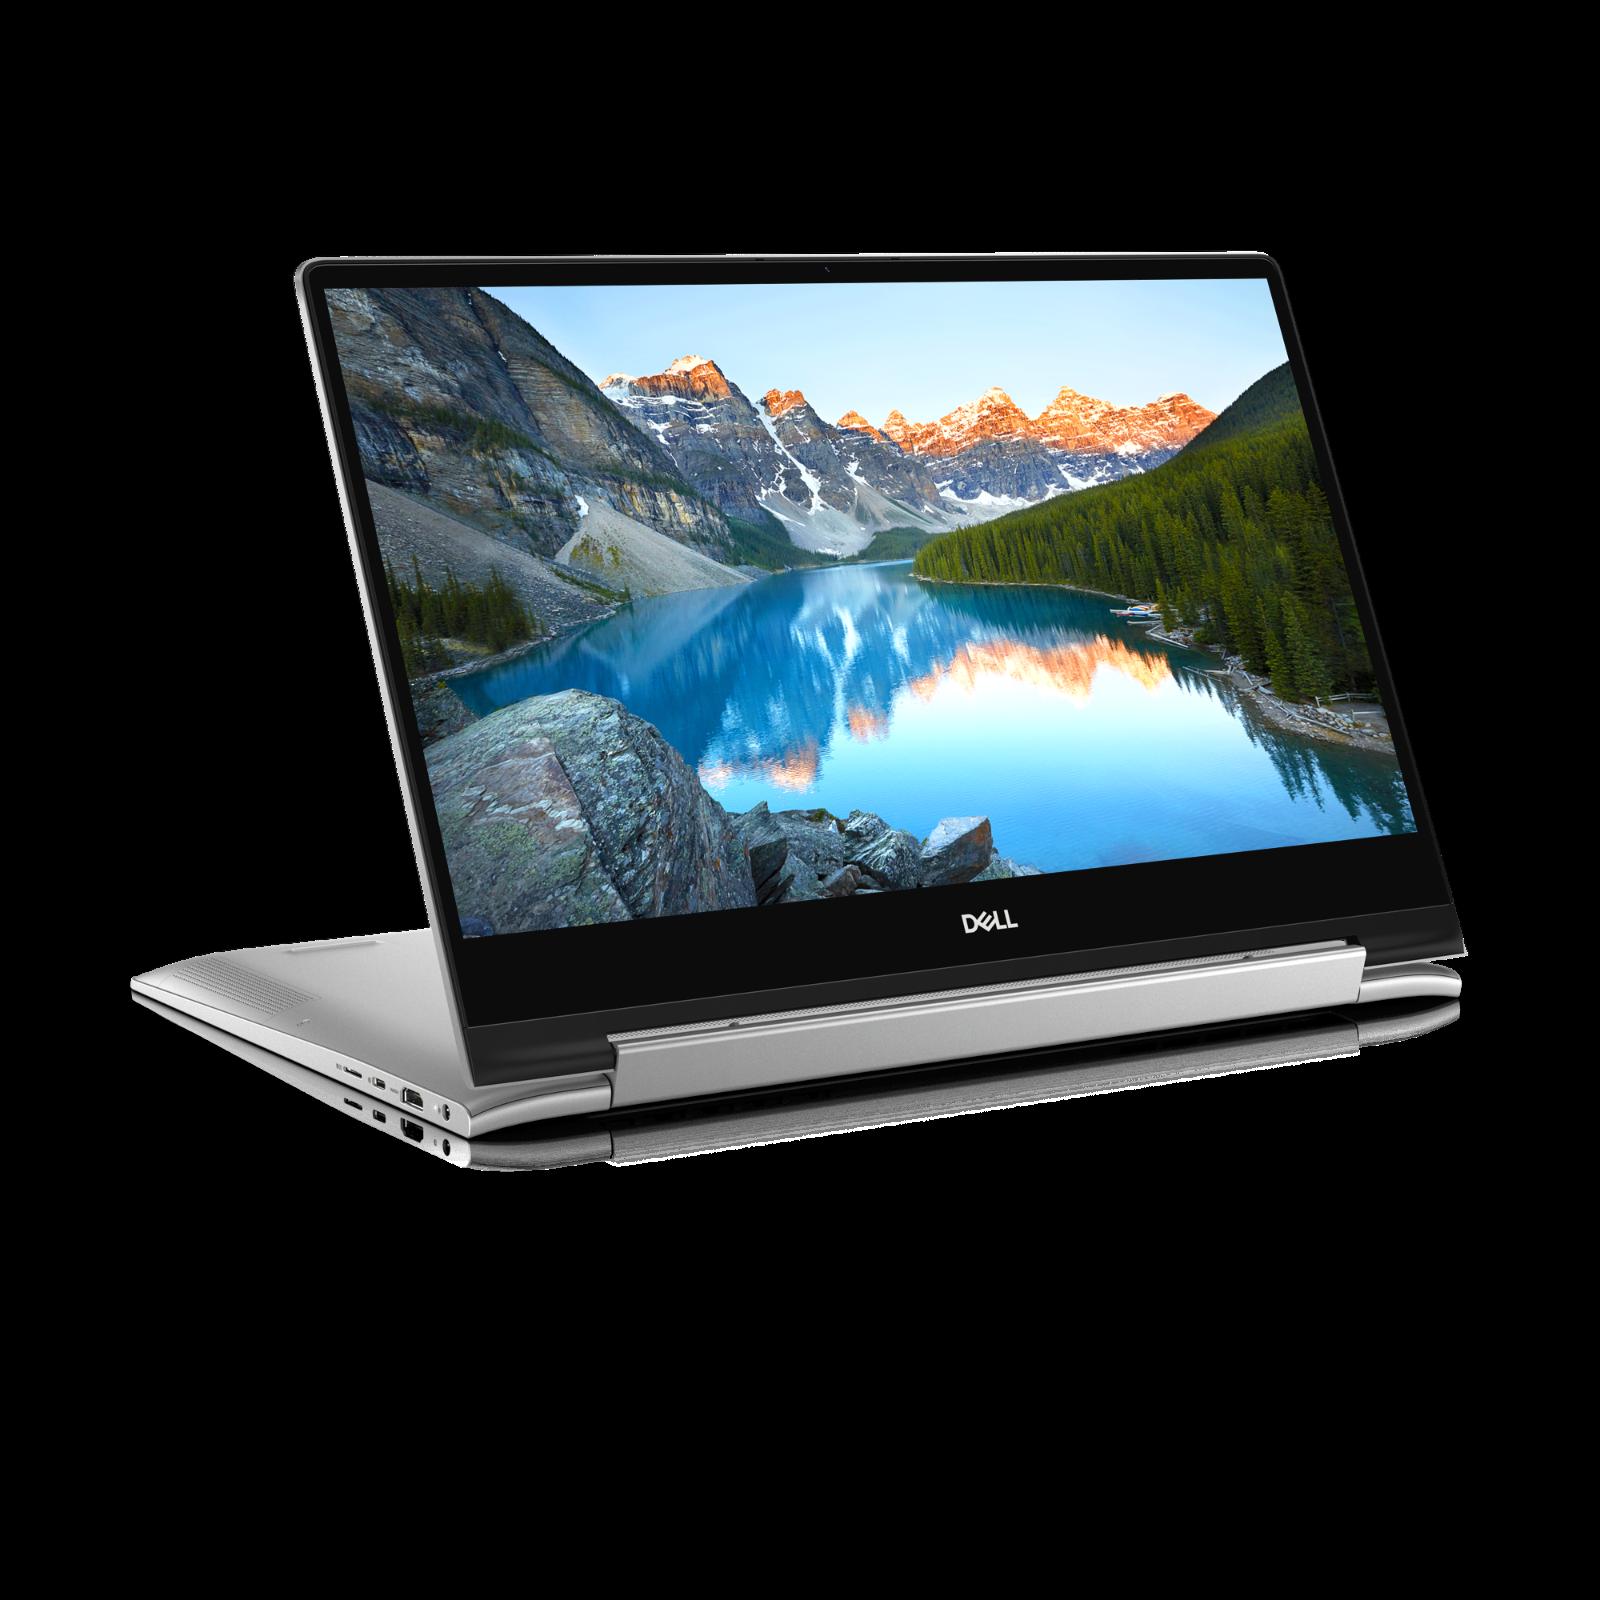 [eBay Dell] Dell Inspiron 15 7591 2 in 1 Laptop 10th Gen Intel i7-10510U 8GB RAM 512GB